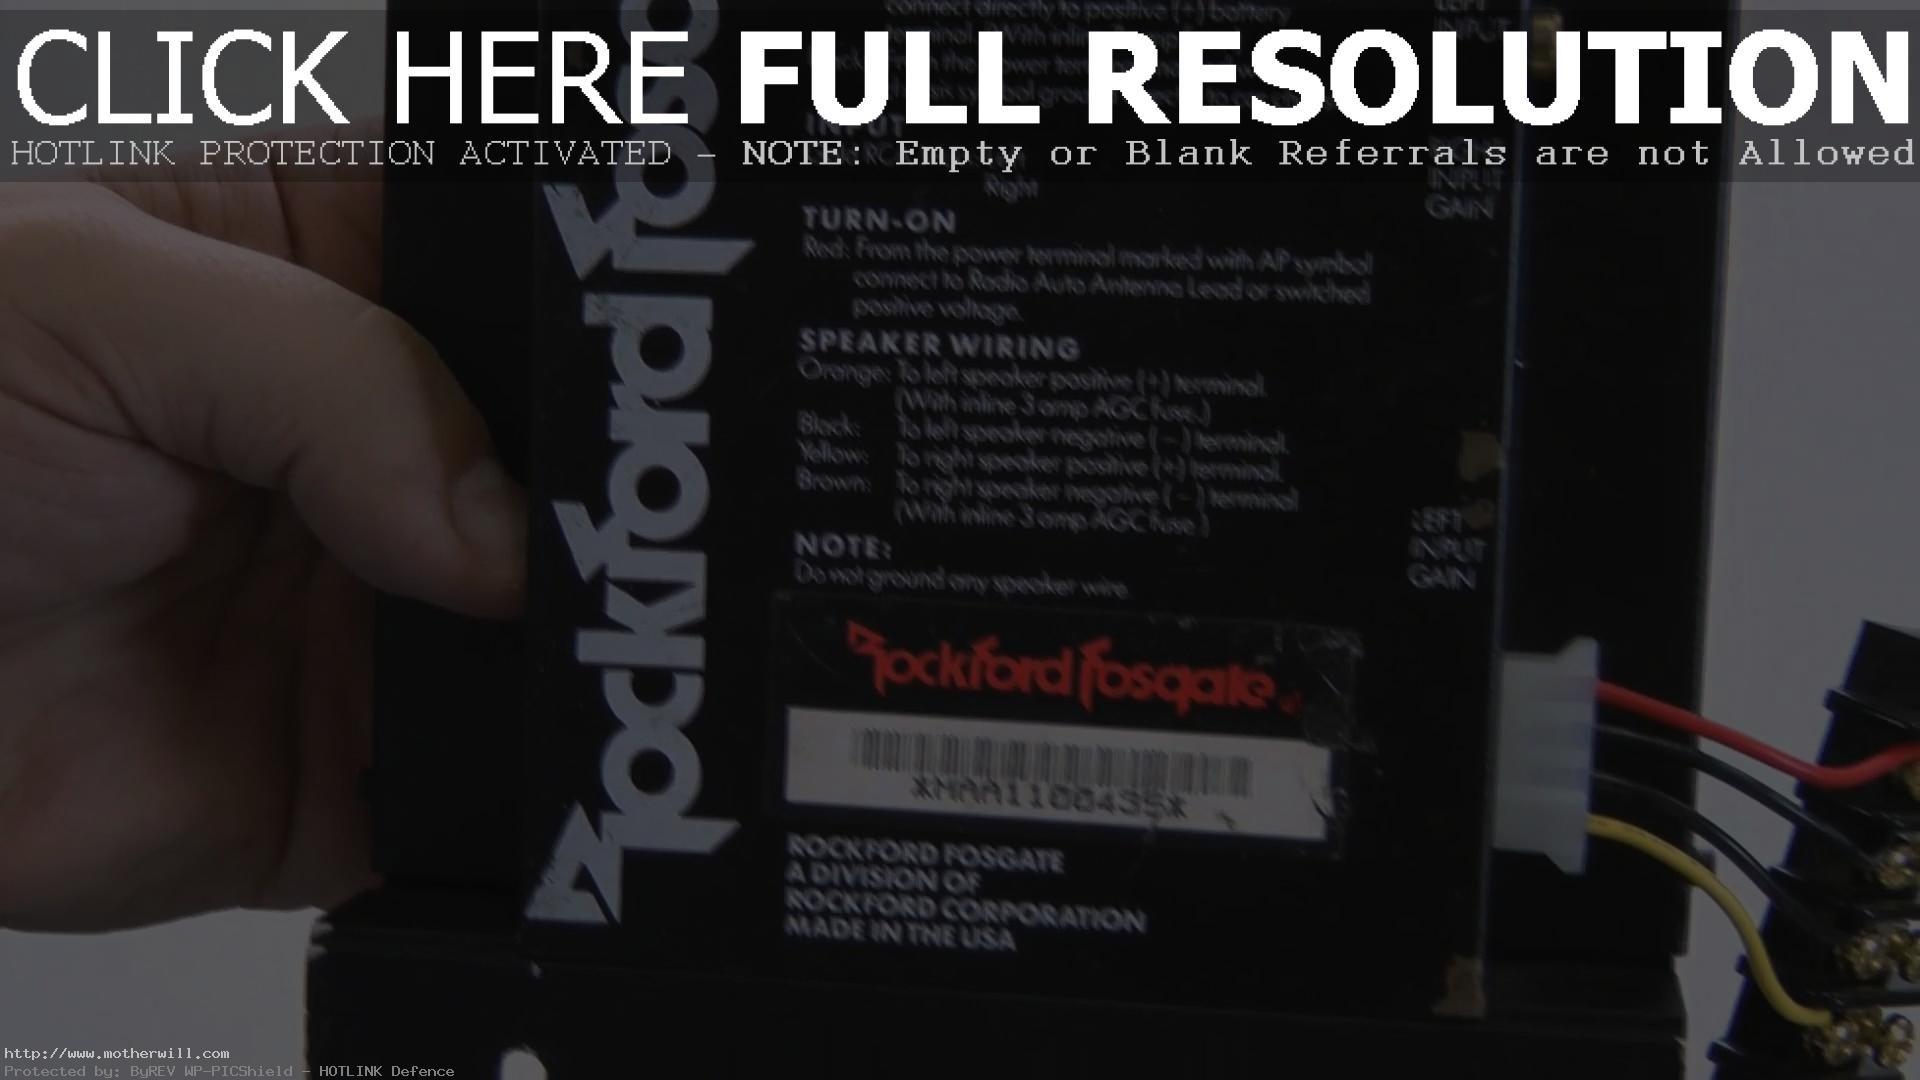 Rockford Fosgate Wallpaper (46+ images) on